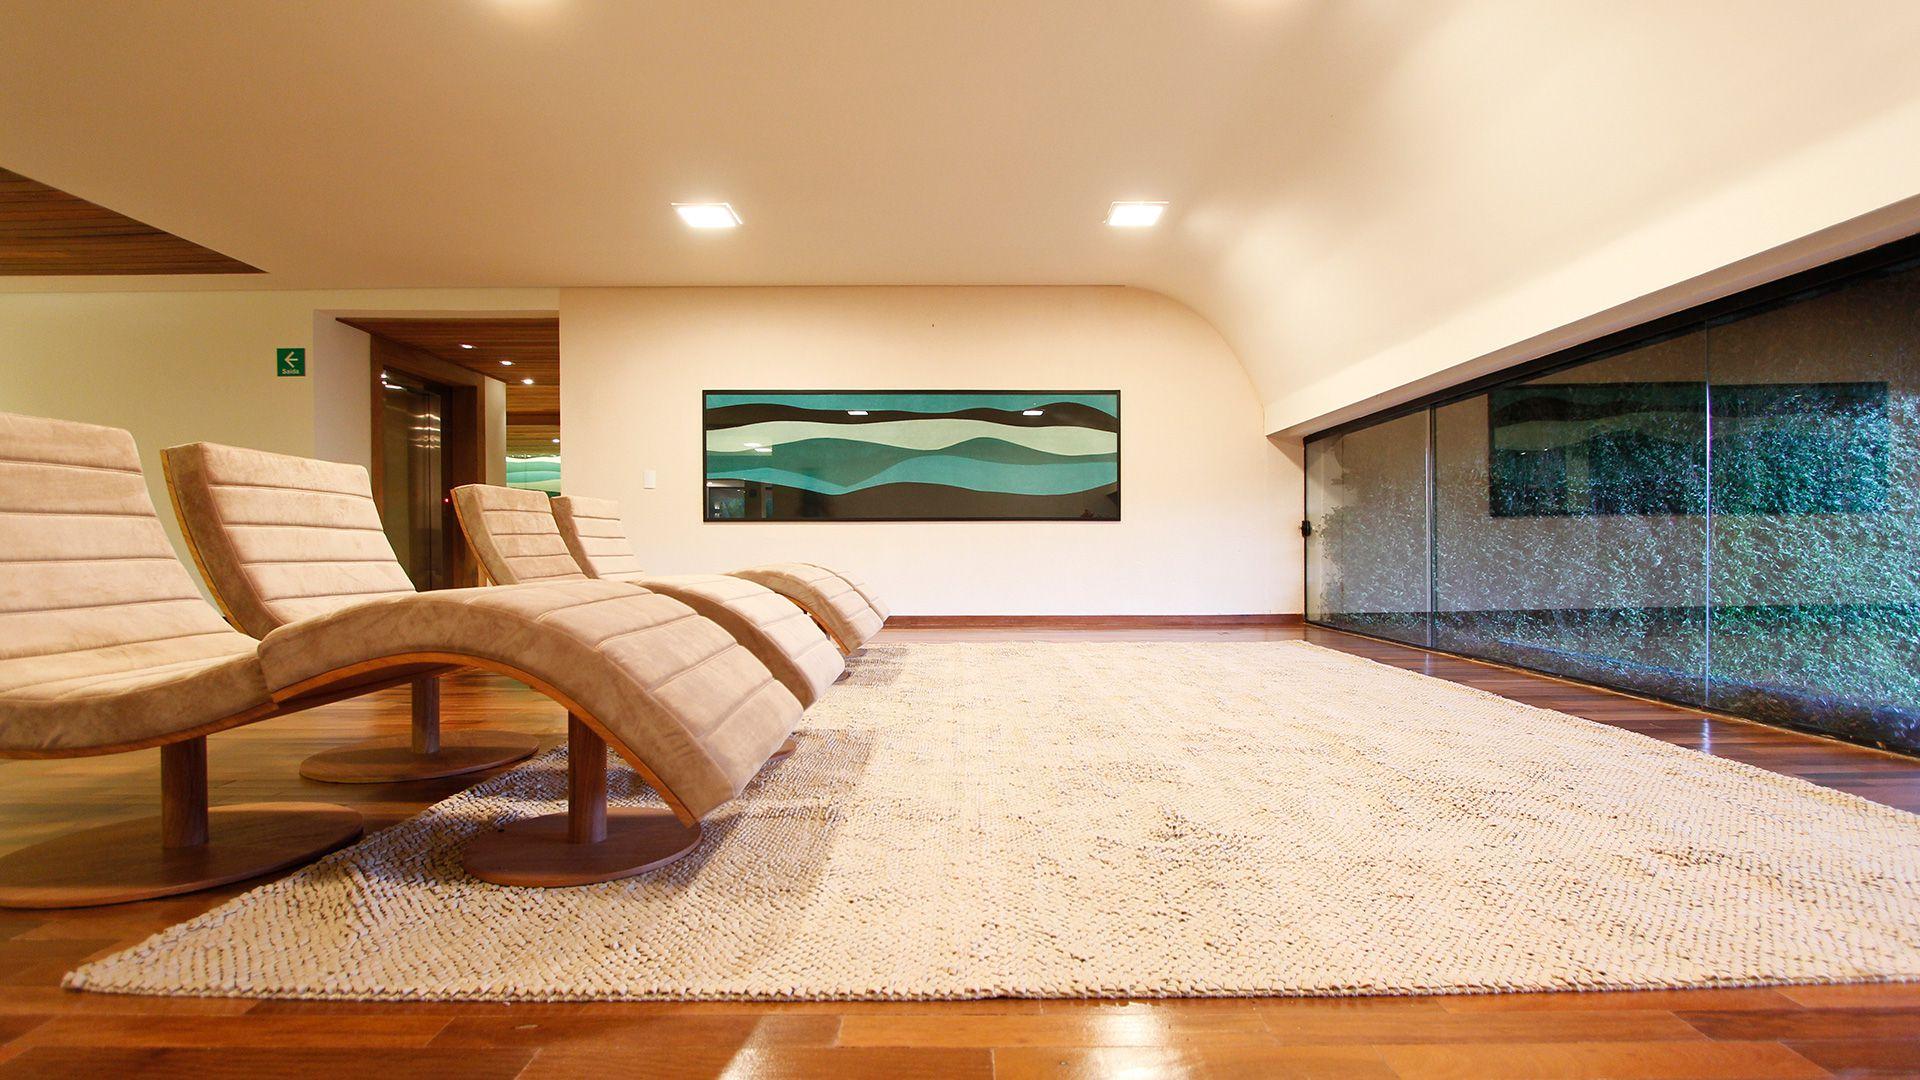 7-spa-hotel-botanique-foto-sala-estar-com-mobiliario-serigrafia